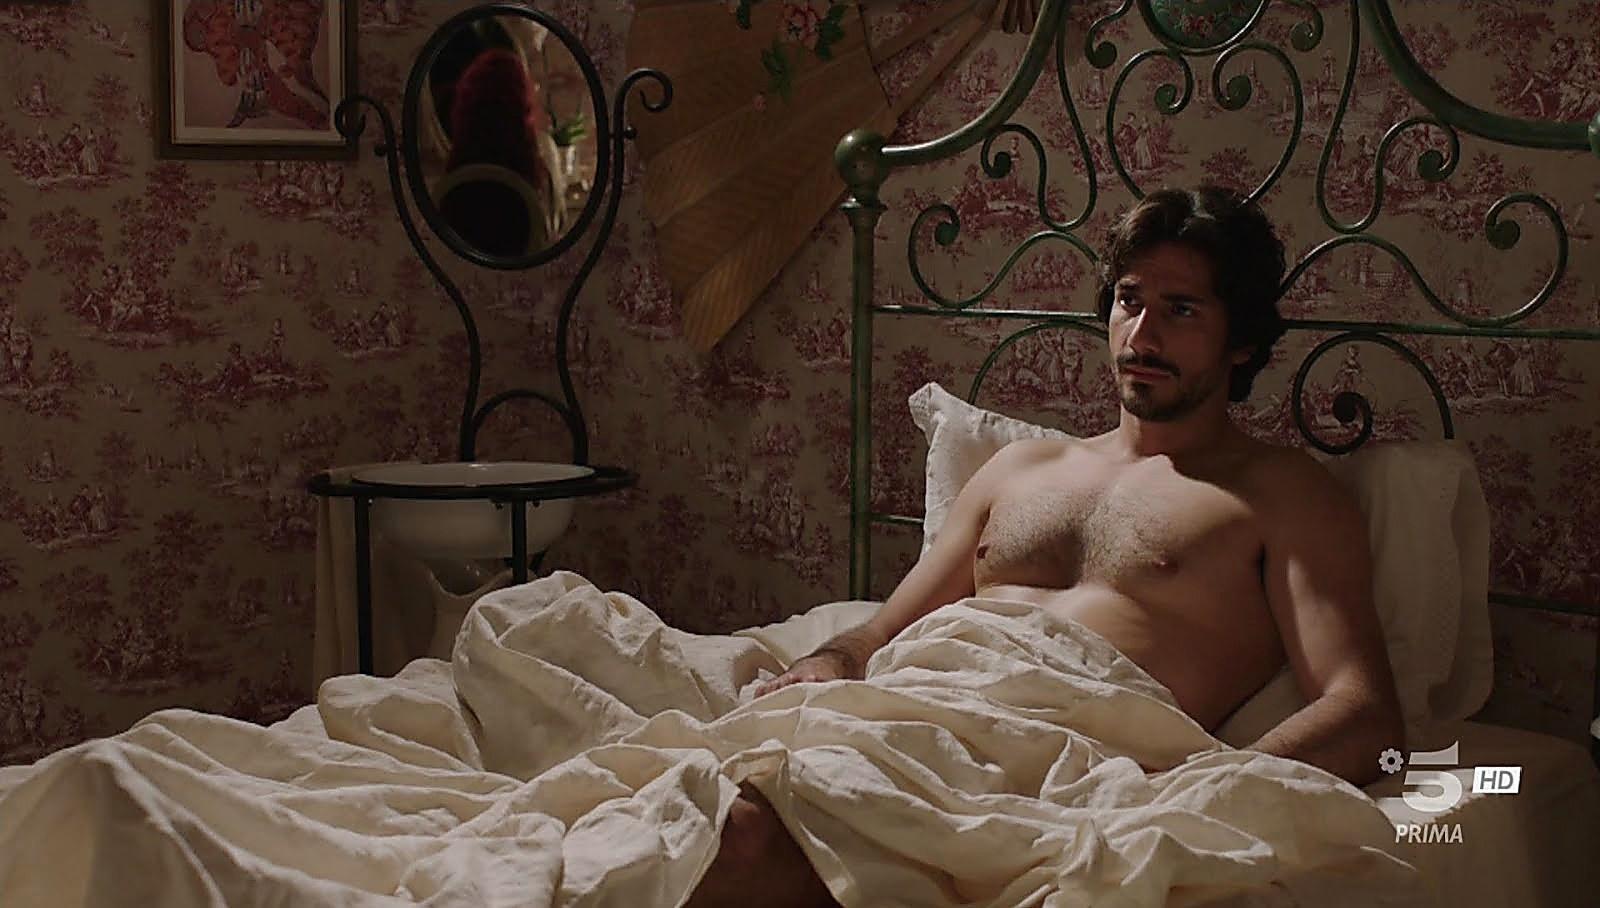 Francesco Arca sexy shirtless scene July 21, 2018, 1pm